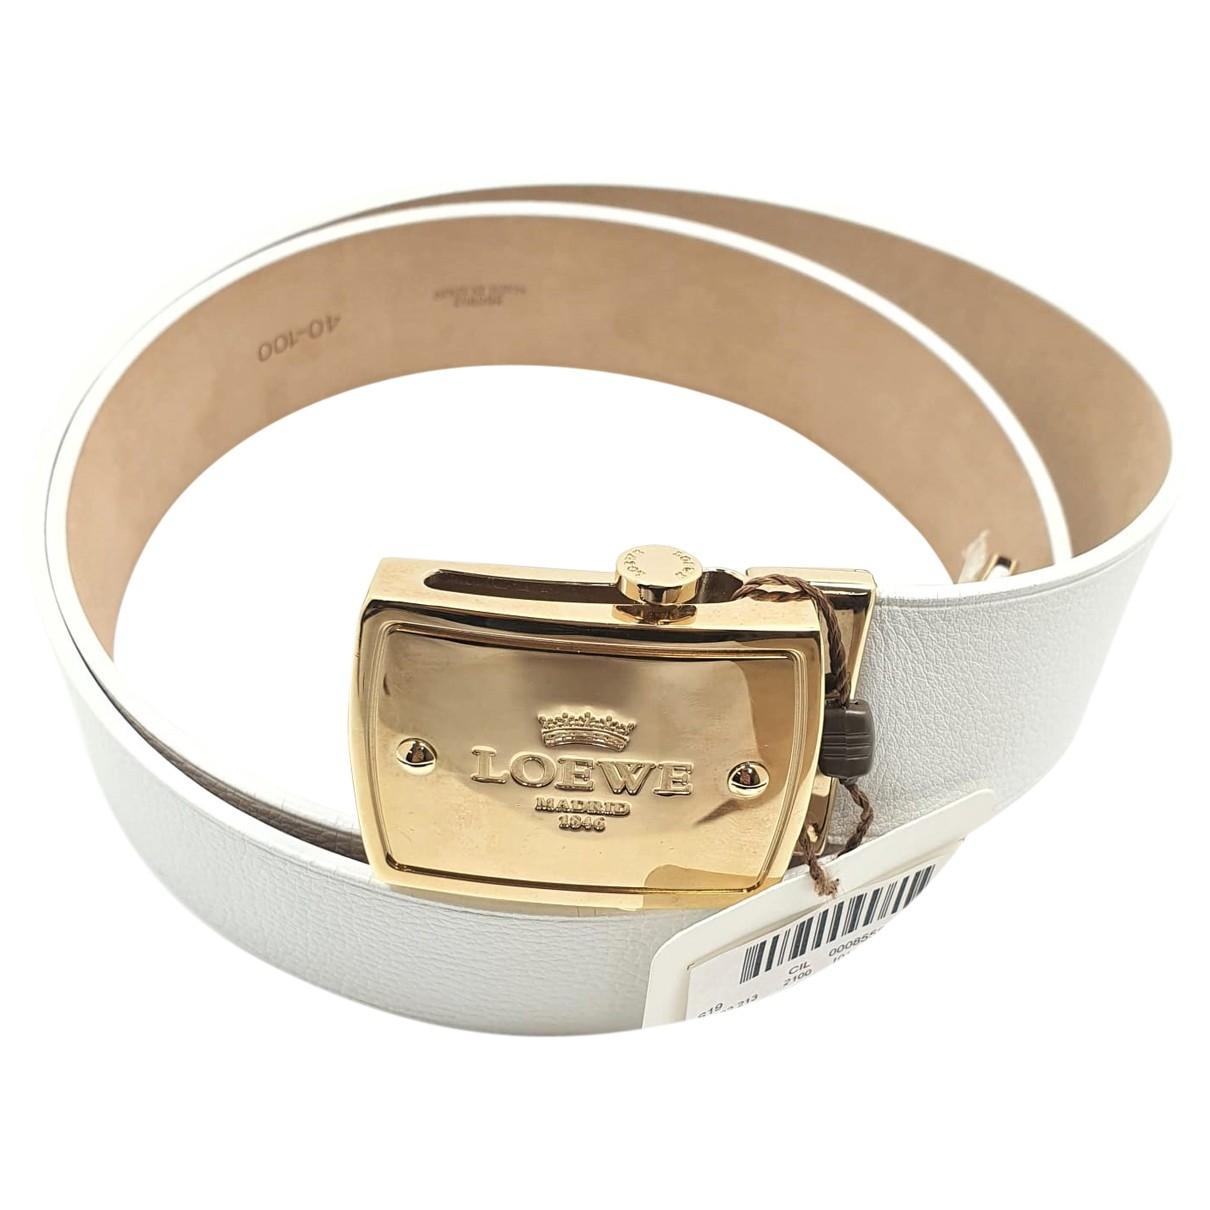 Loewe \N White Leather belt for Women L